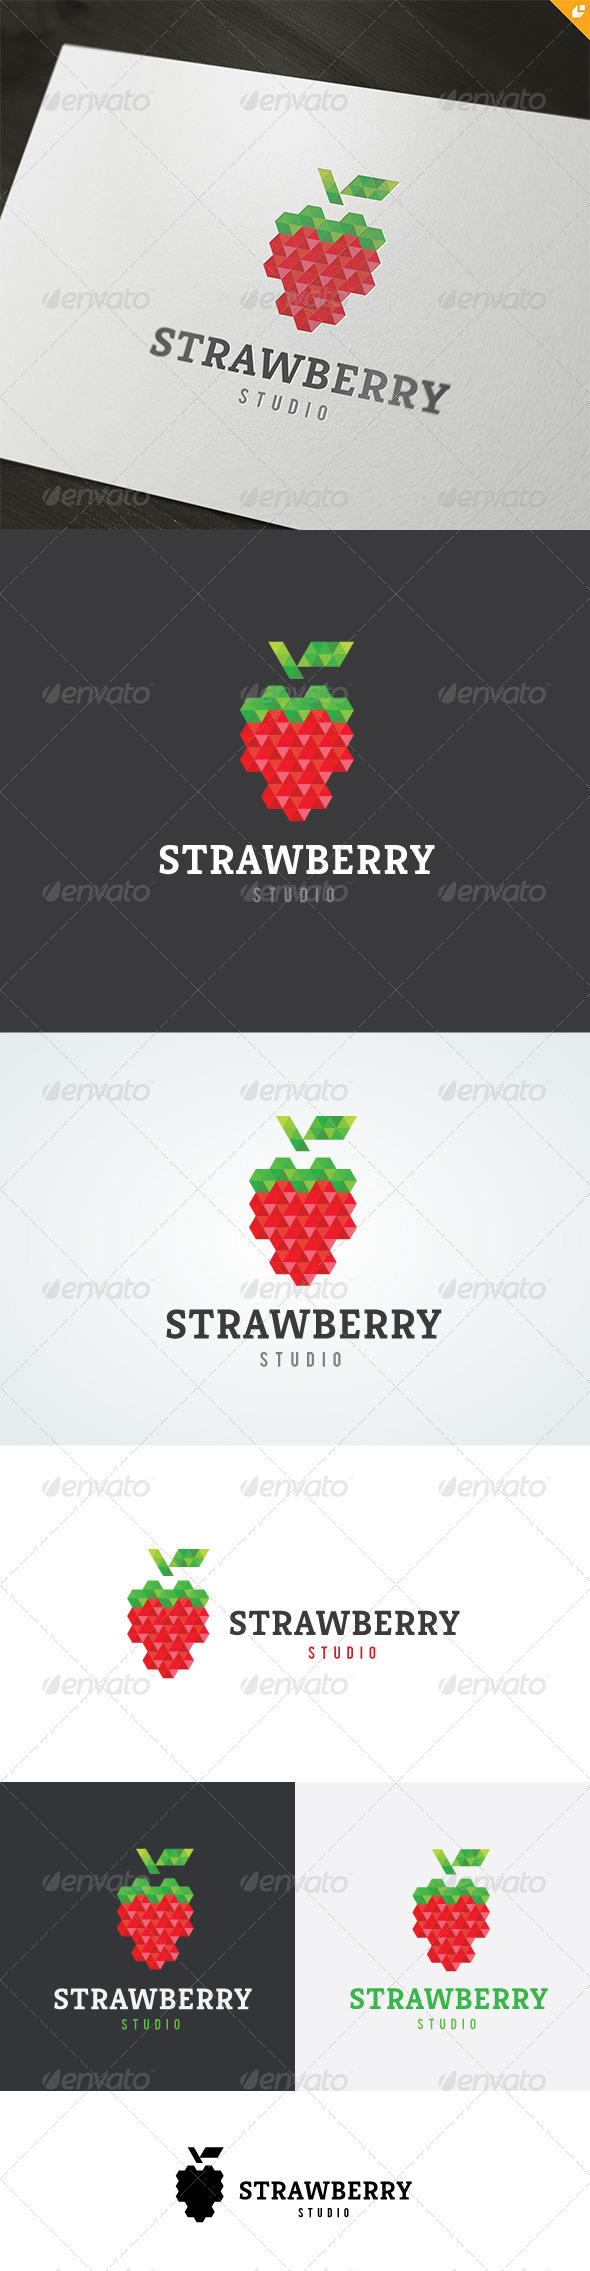 Strawberry Studio Logo - Food Logo Templates